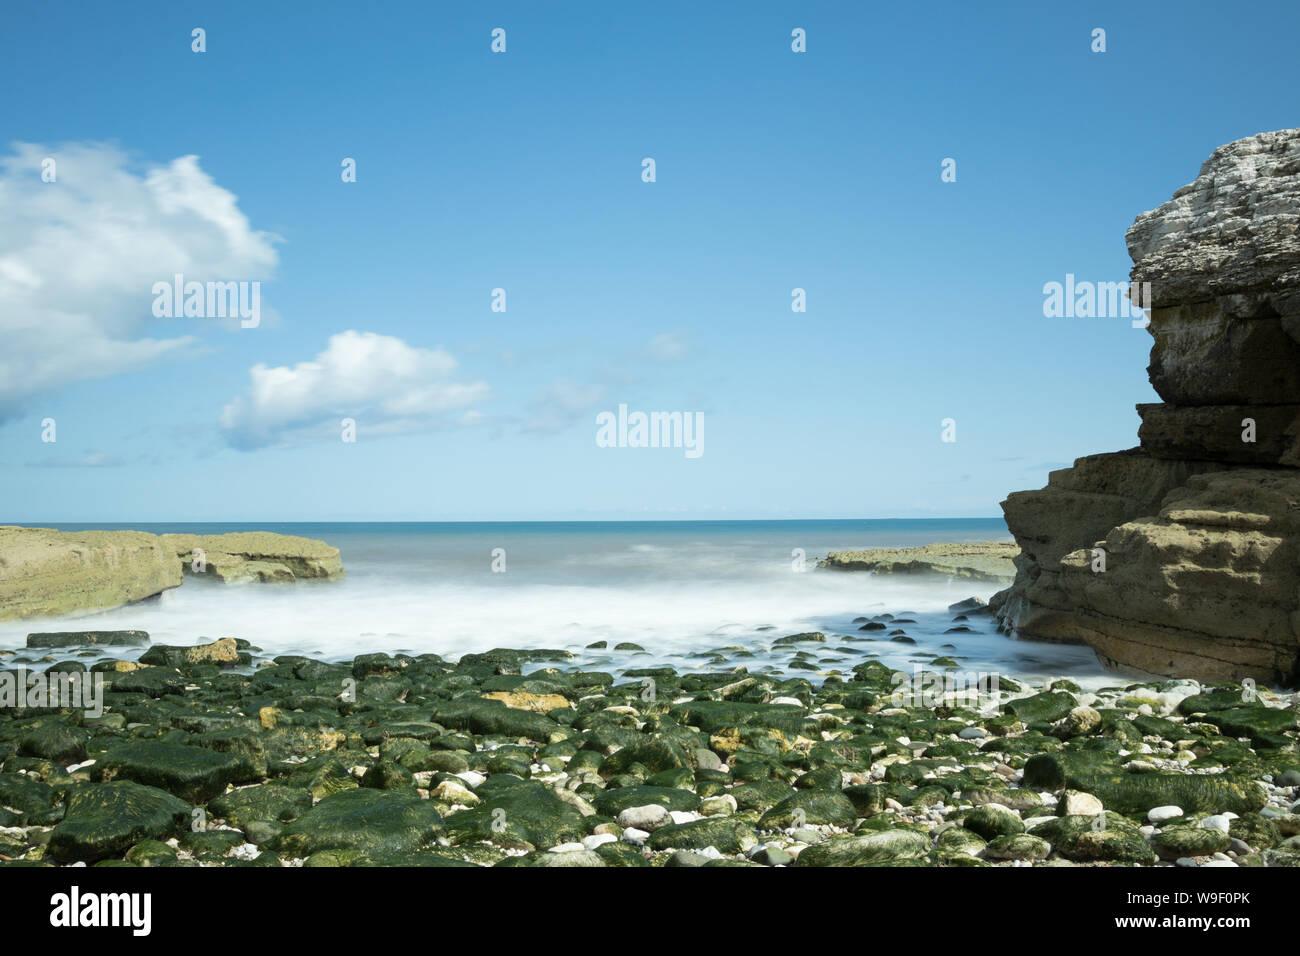 The rocky shore at Thornwick Nab near Flamborough Head on the East Yorkshire coast Stock Photo